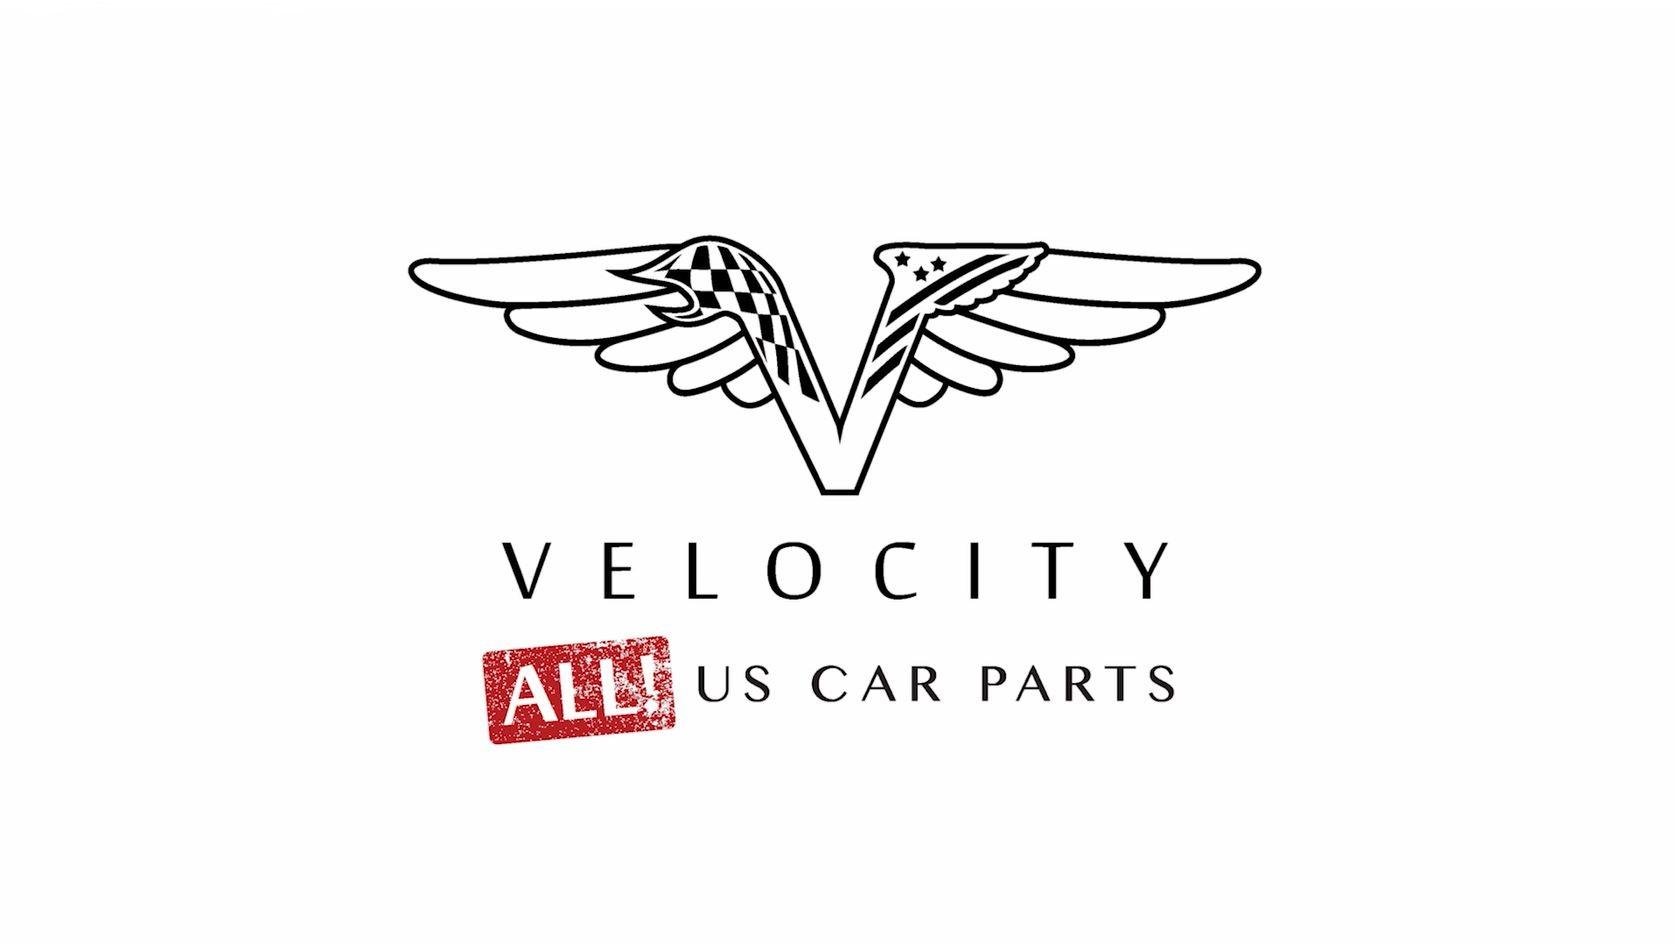 Velocity - ALL US Car Parts